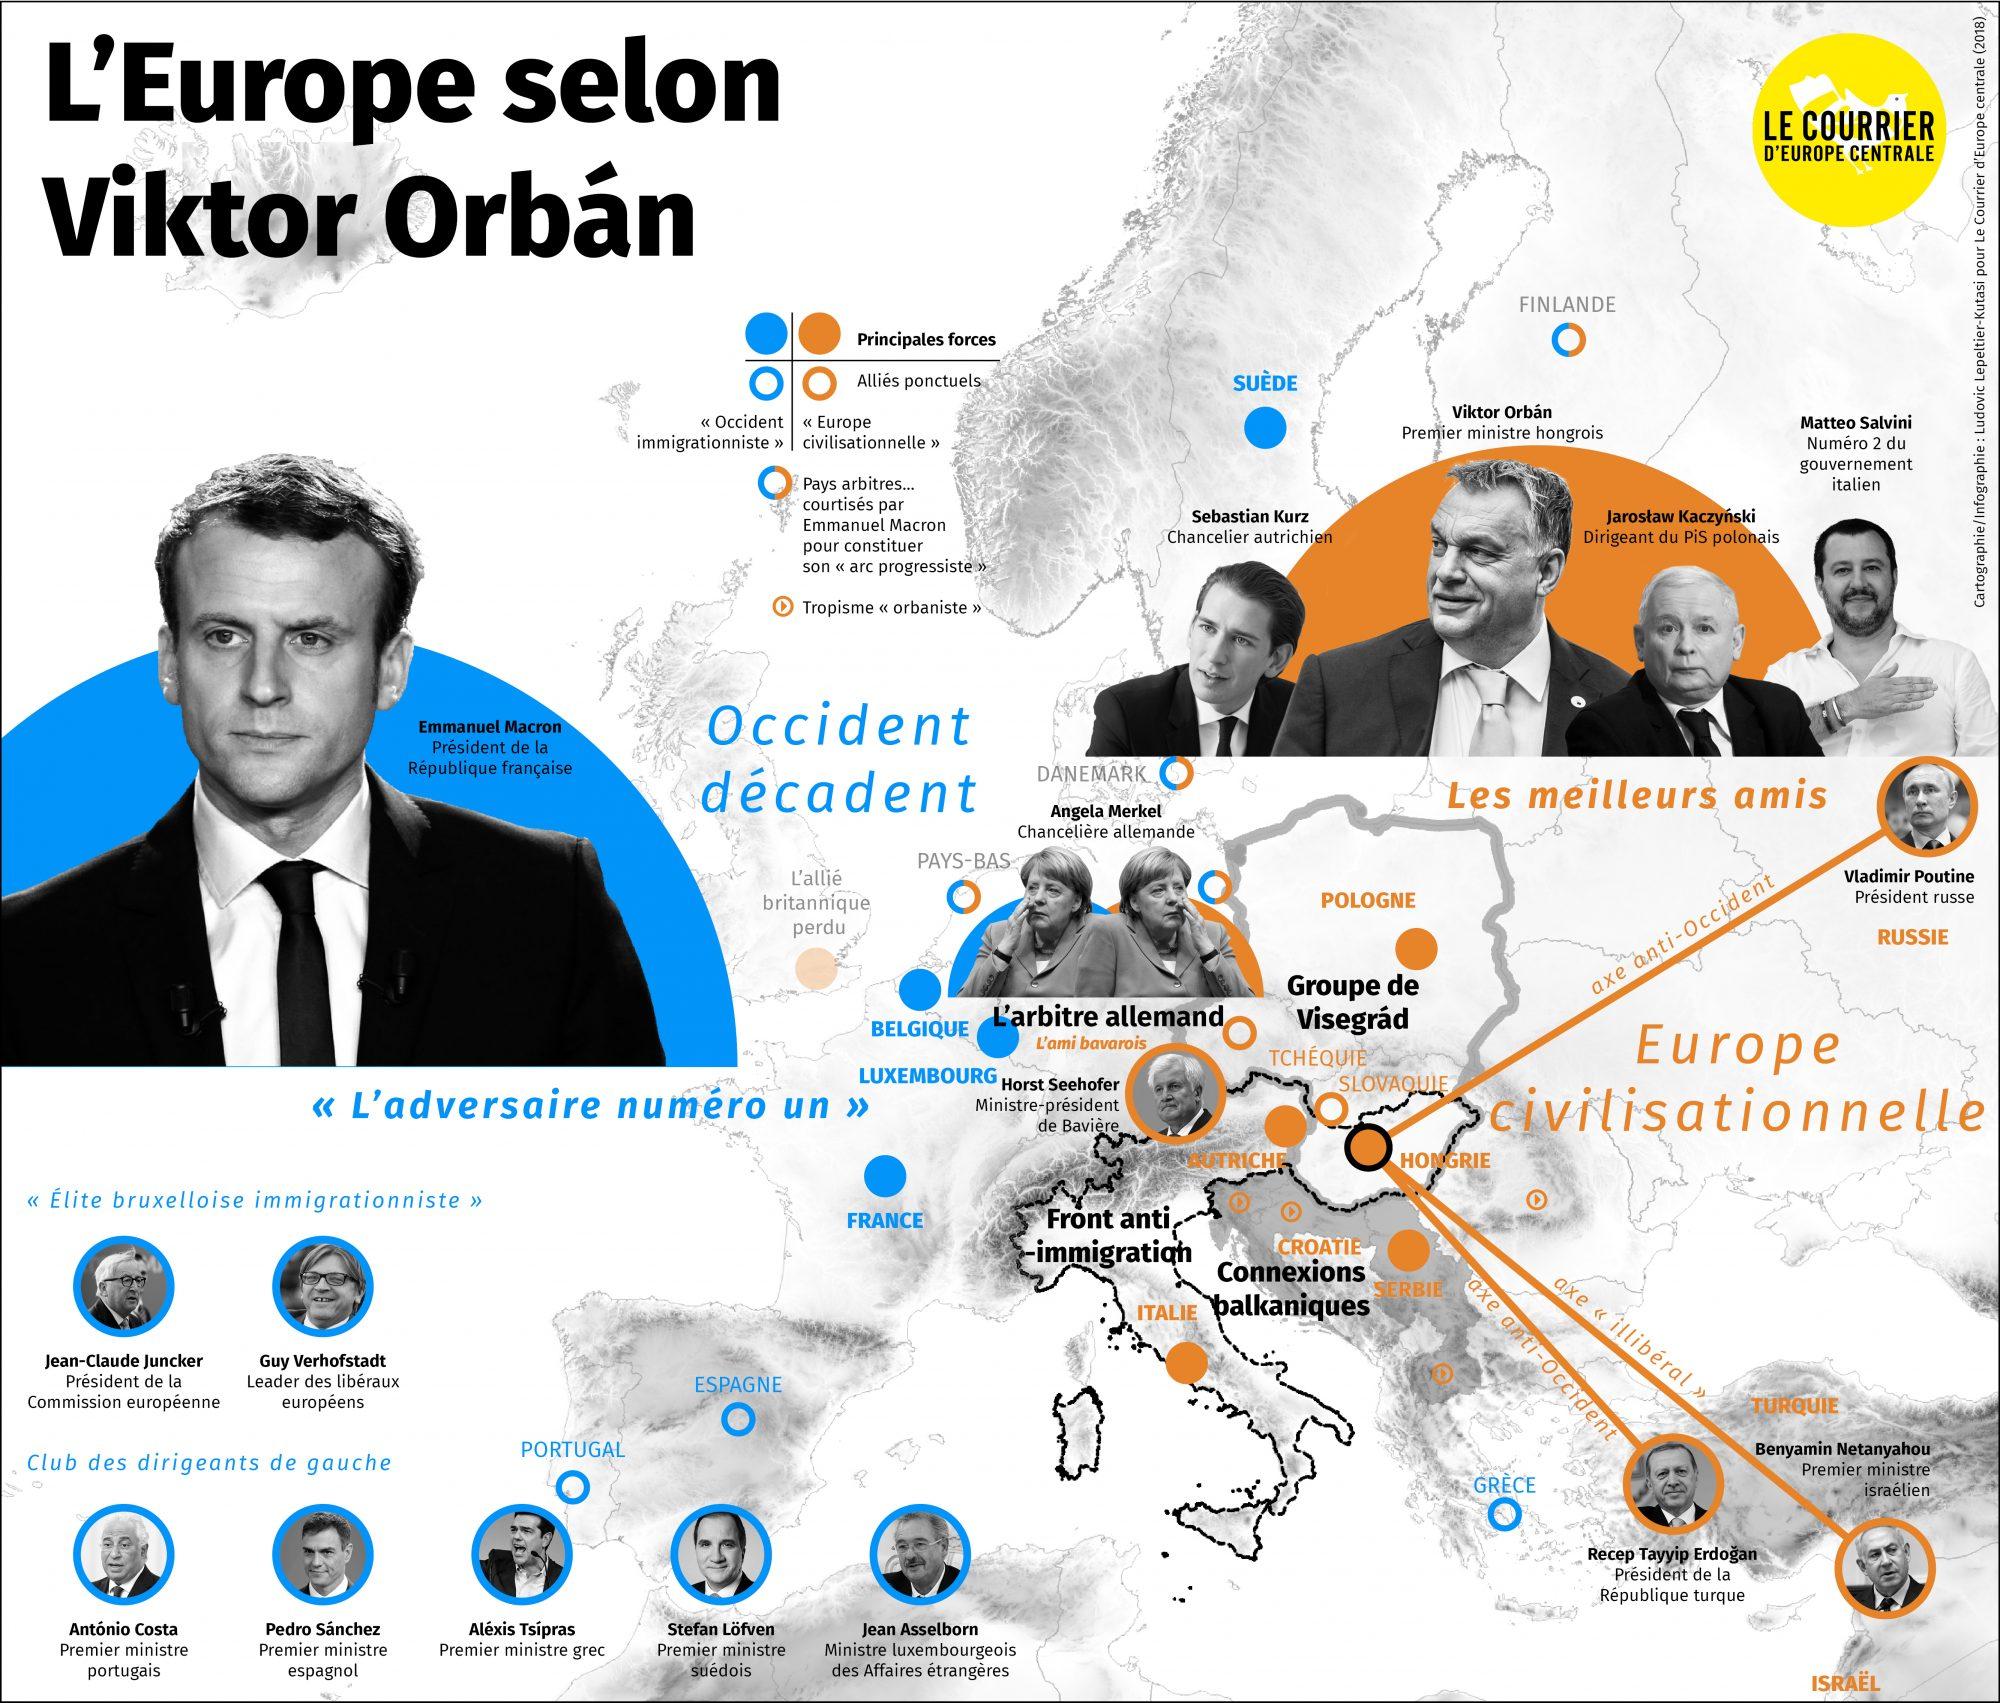 La Nouvelle Carte De LEurope Selon Viktor Orbn